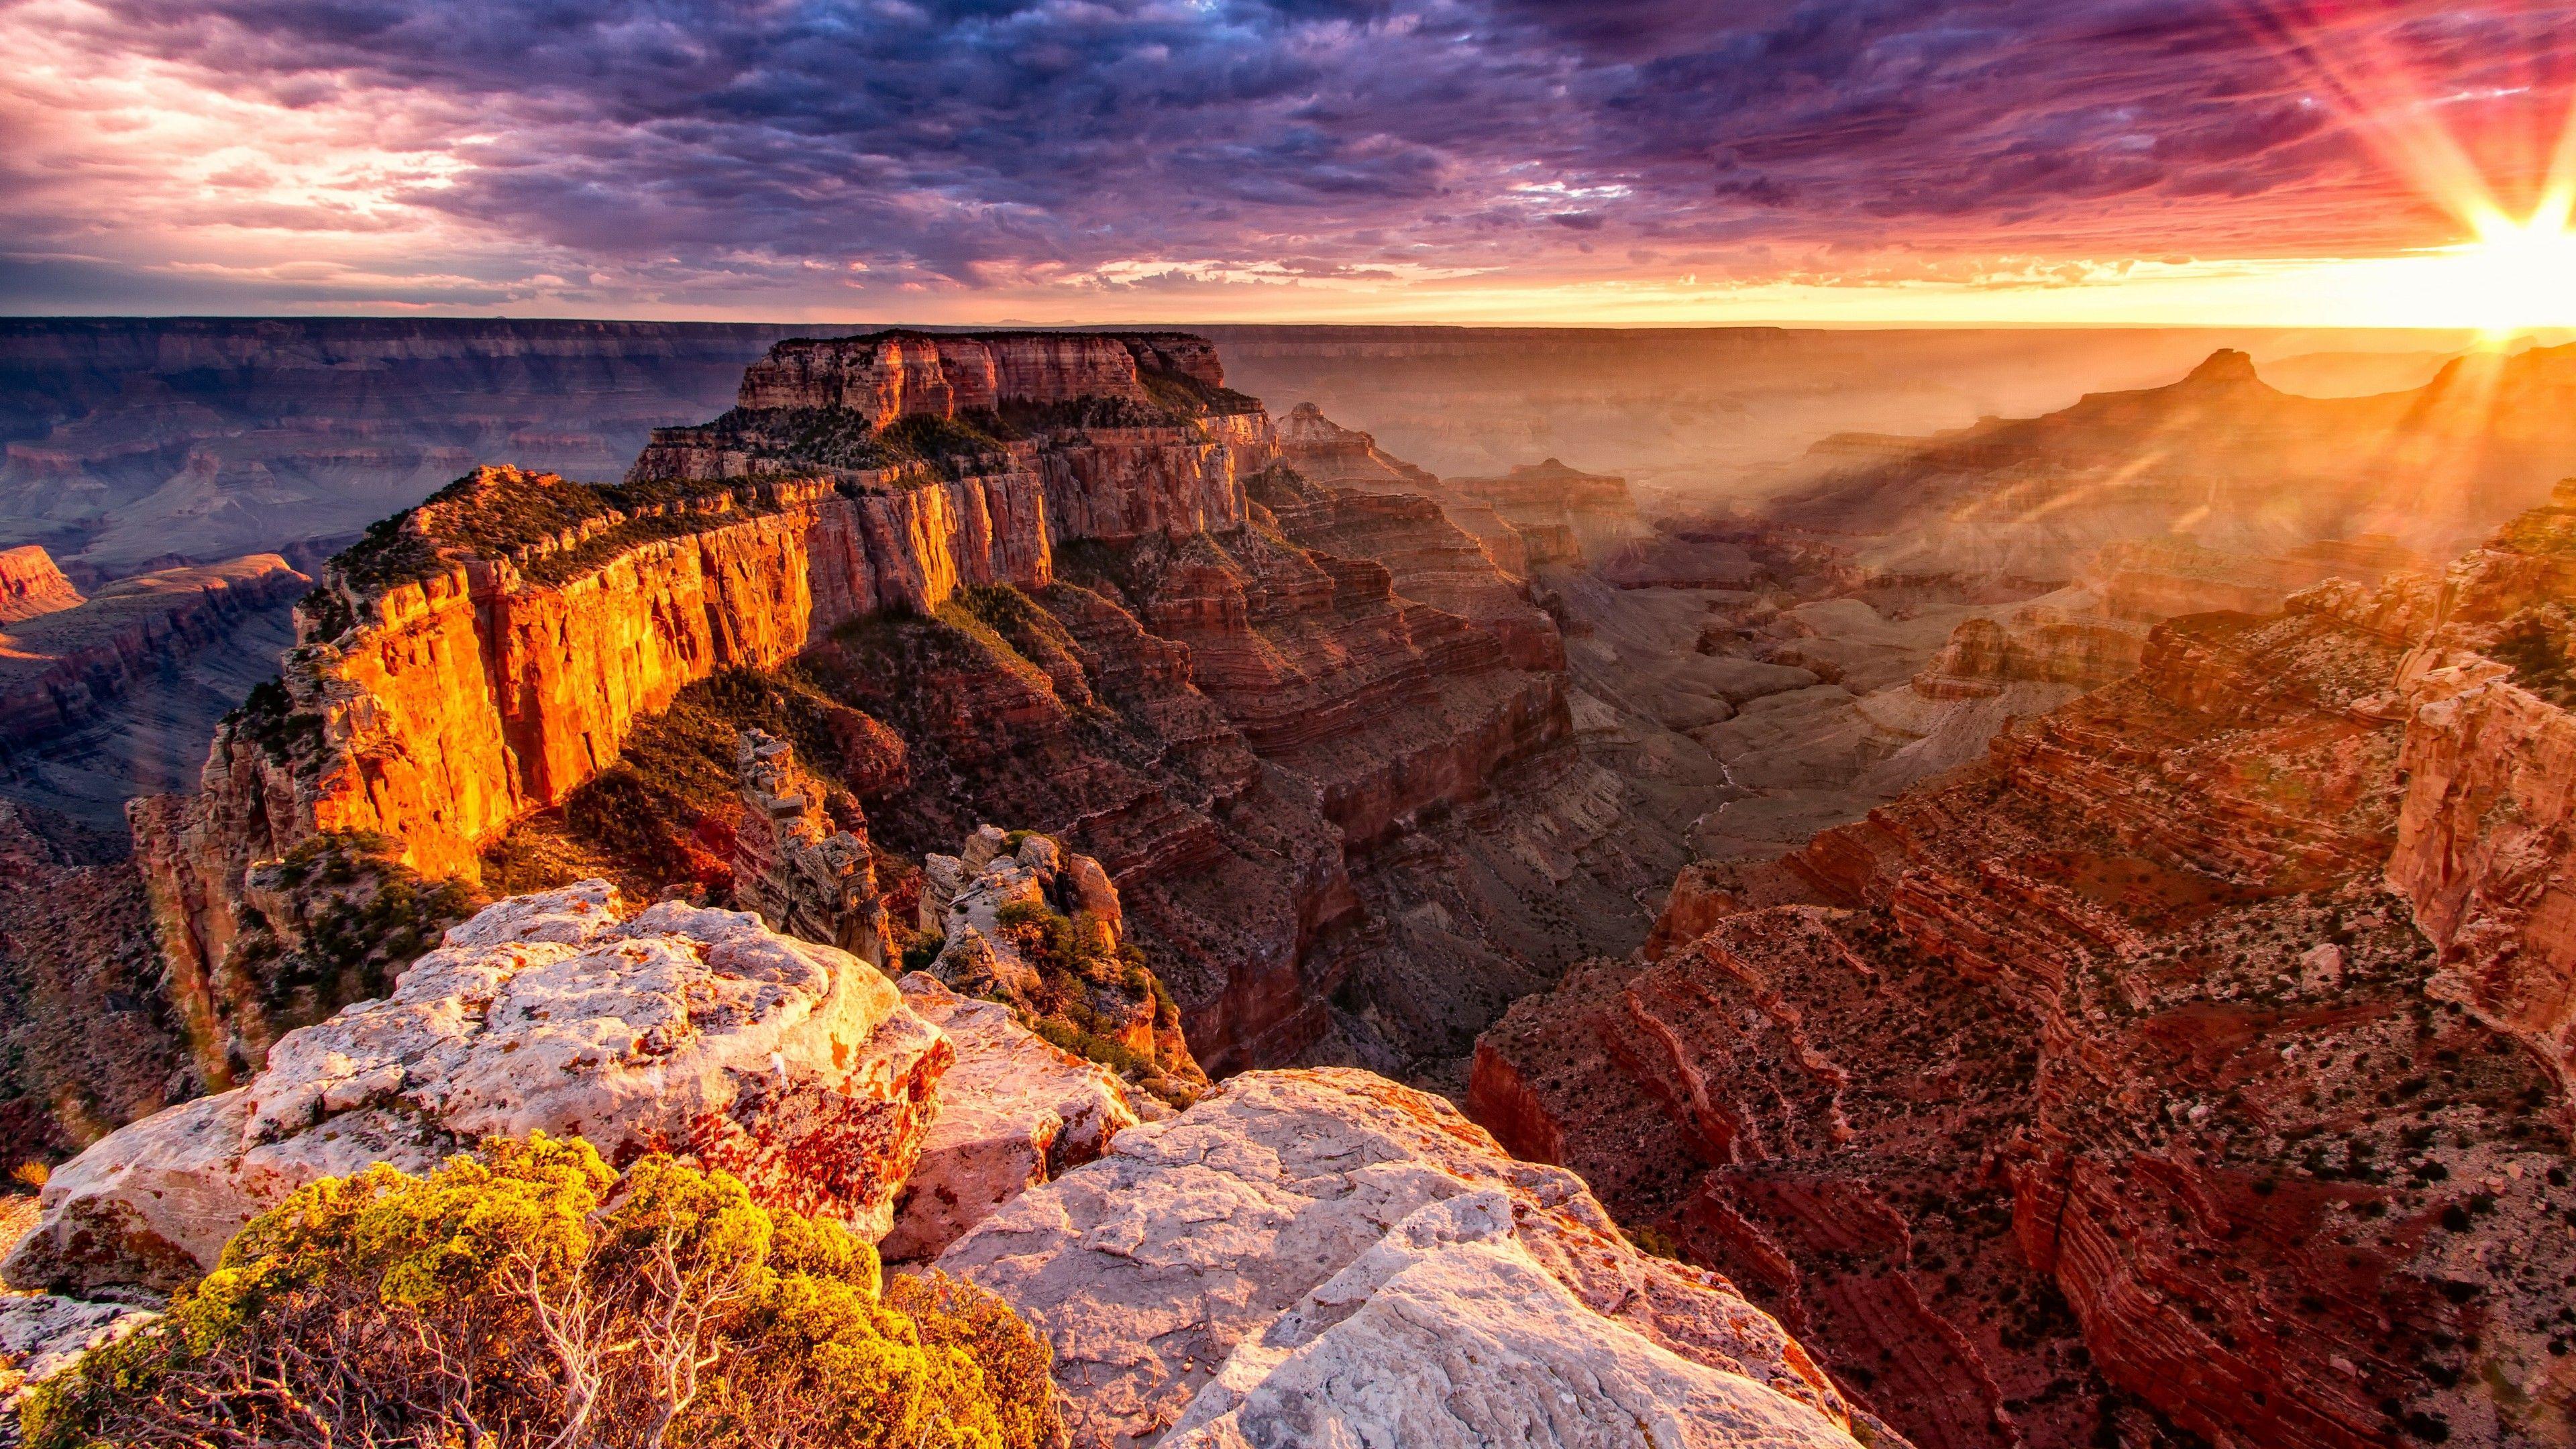 8K Ultra HD Canyon Wallpapers - Top Free 8K Ultra HD ...